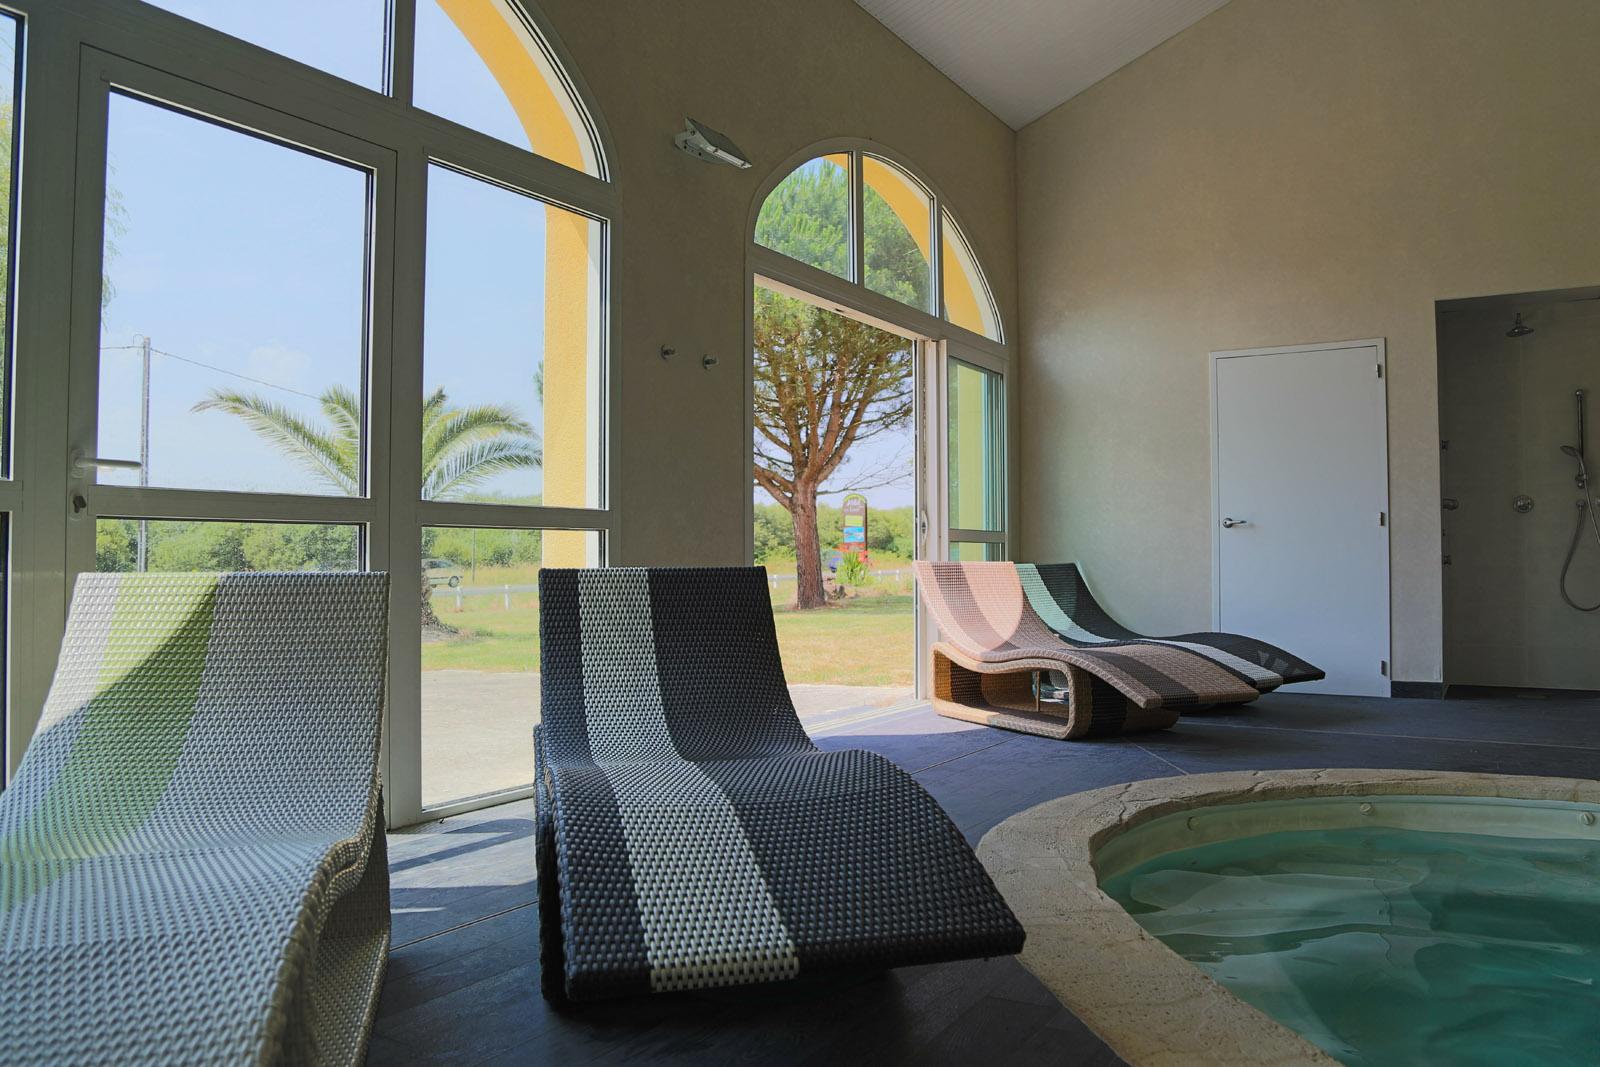 Espace piscine sauna hammam hotel de la lou e for Espace sauna hammam